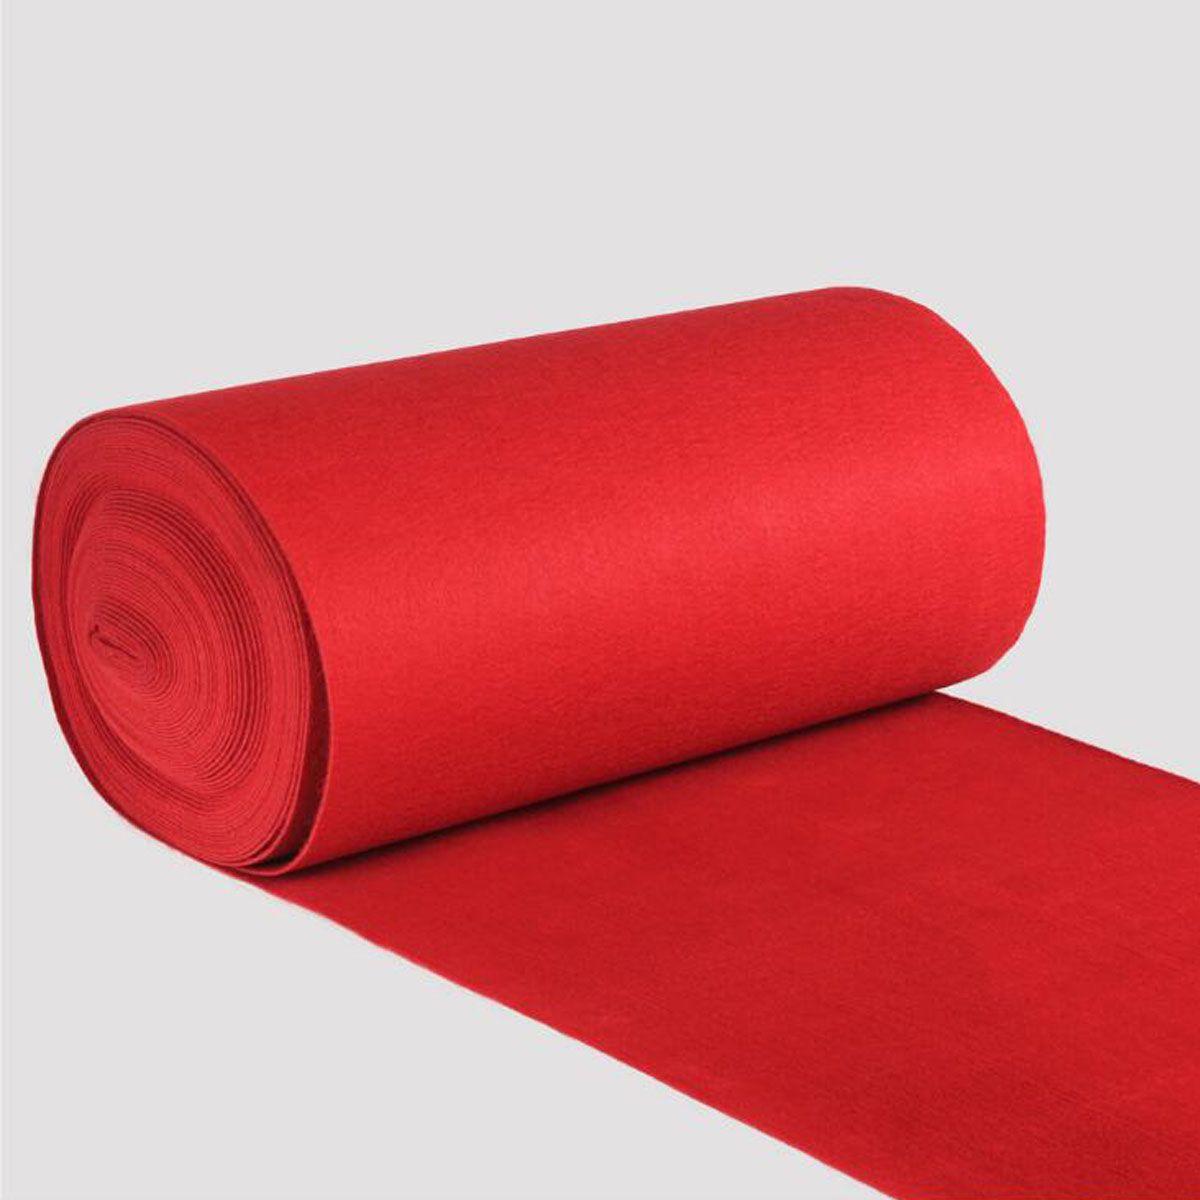 15m/10m Outdoor Red Carpet Mats Aisle for Wedding Banquet Film Festivals Parties Celebrations Awards Events Decoration Carpet